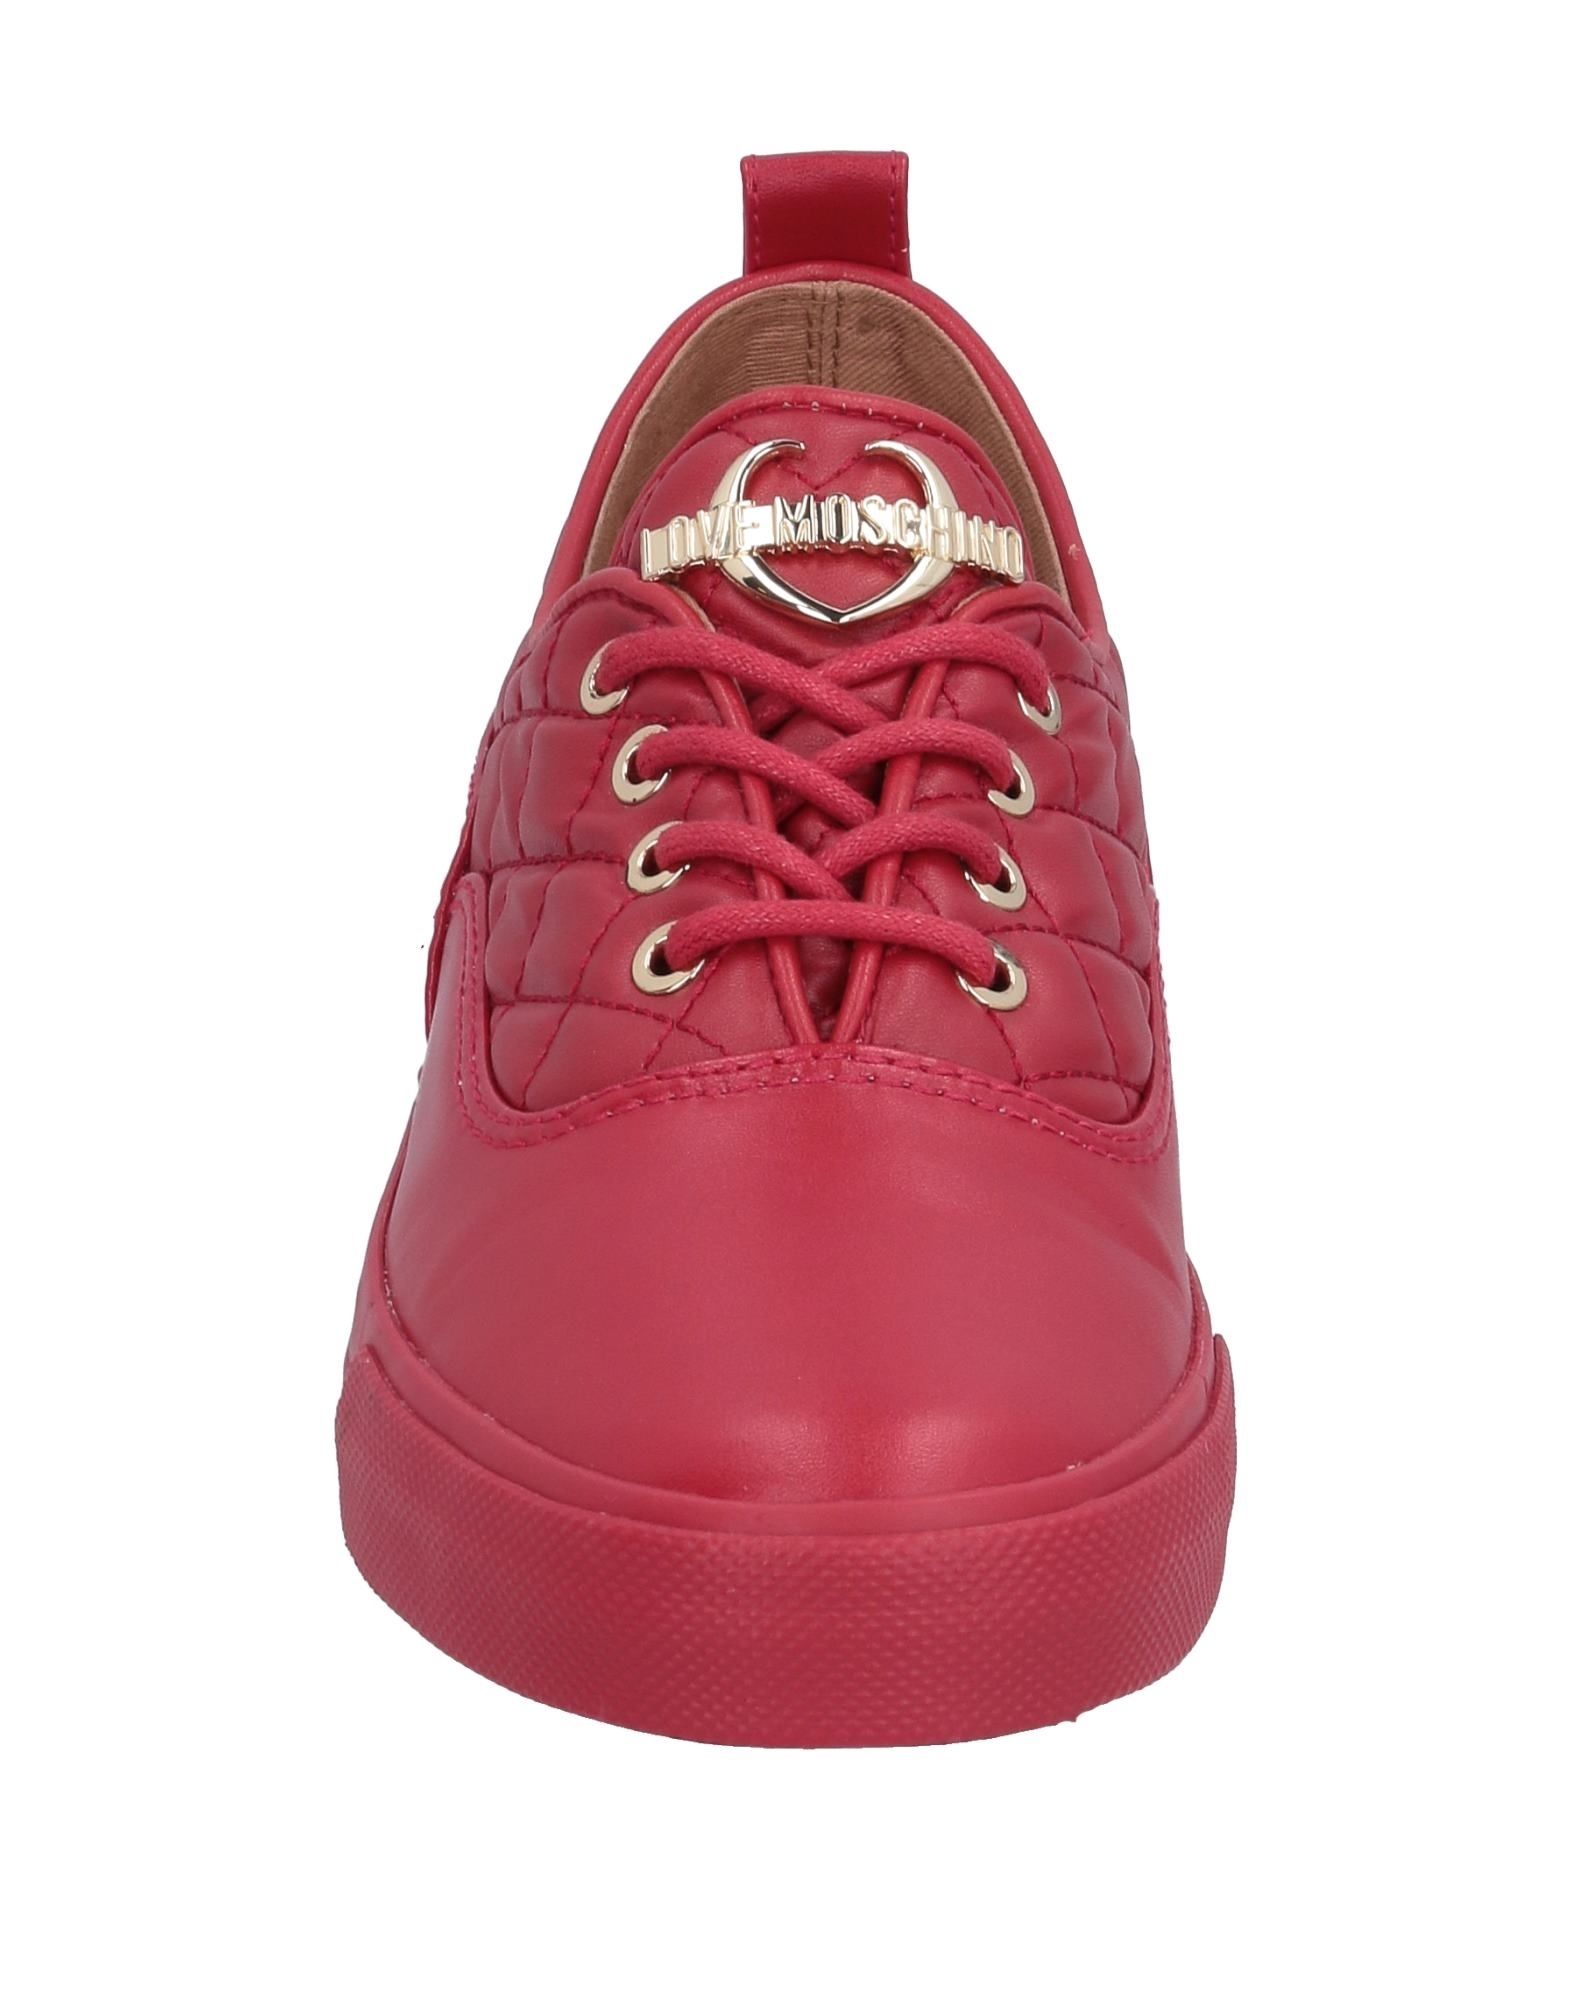 Love Moschino Sneakers Sneakers Sneakers Damen  11527872EL Neue Schuhe 6e9421